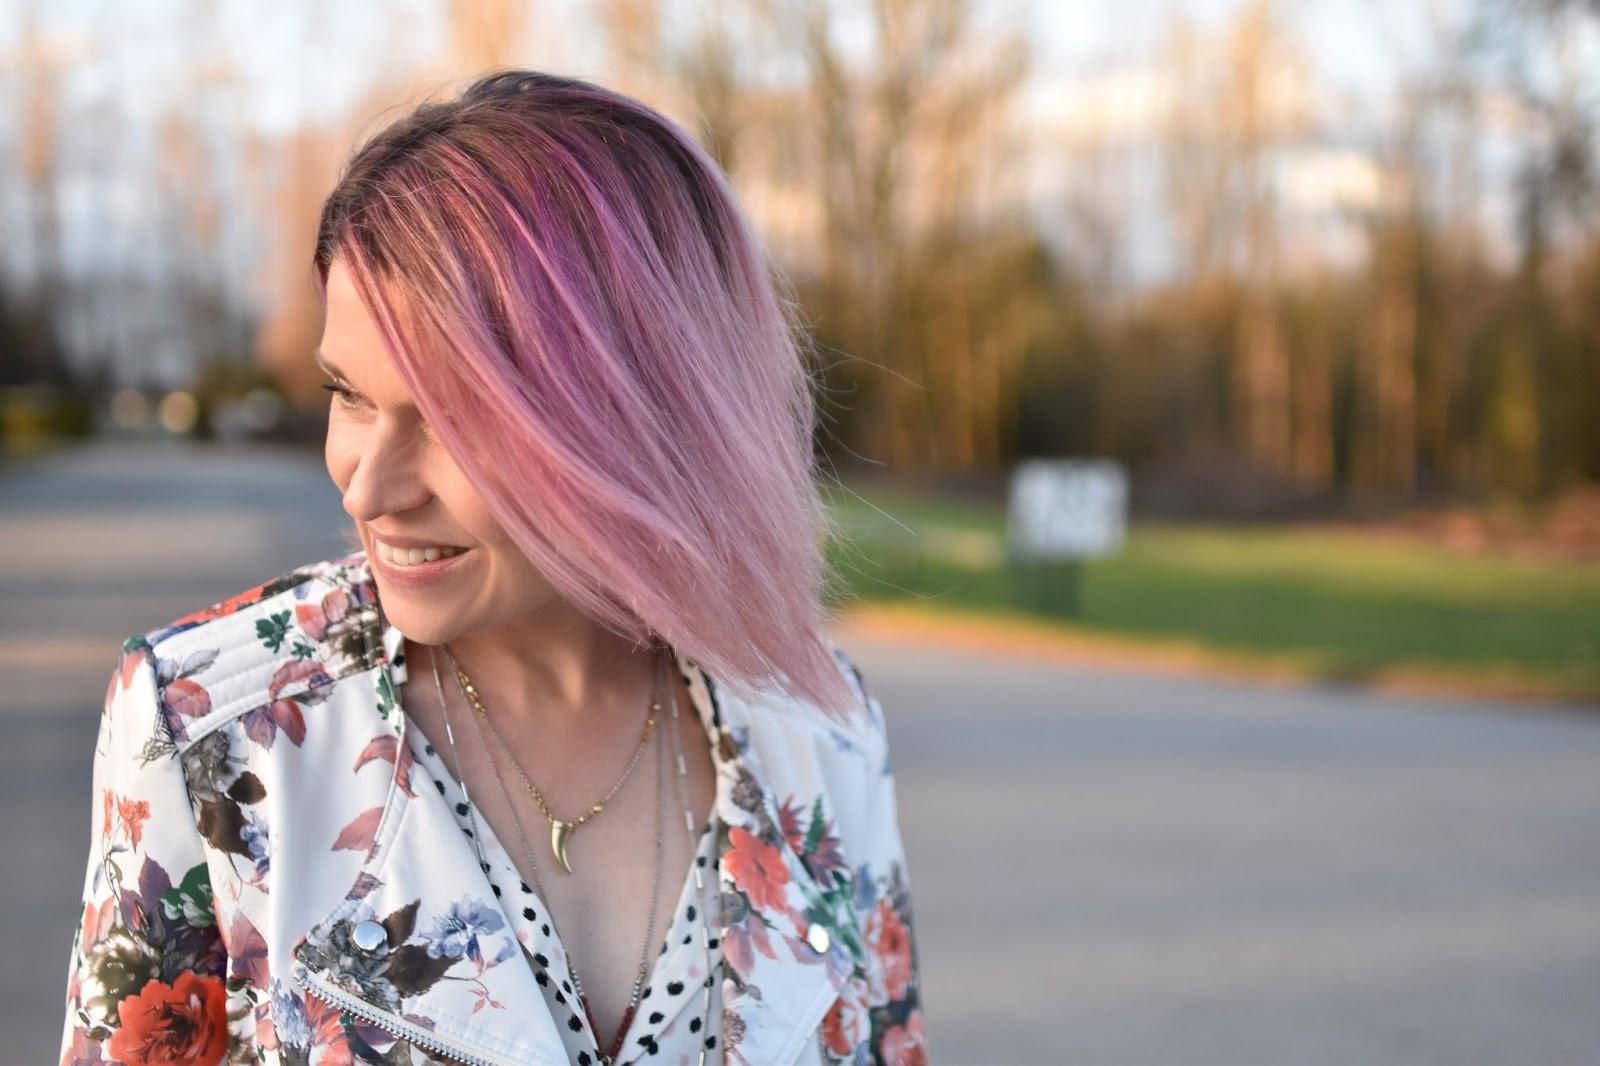 Monika Faulkner outfit inspiration - polka-dotted blouse, floral moto jacket, pink hair